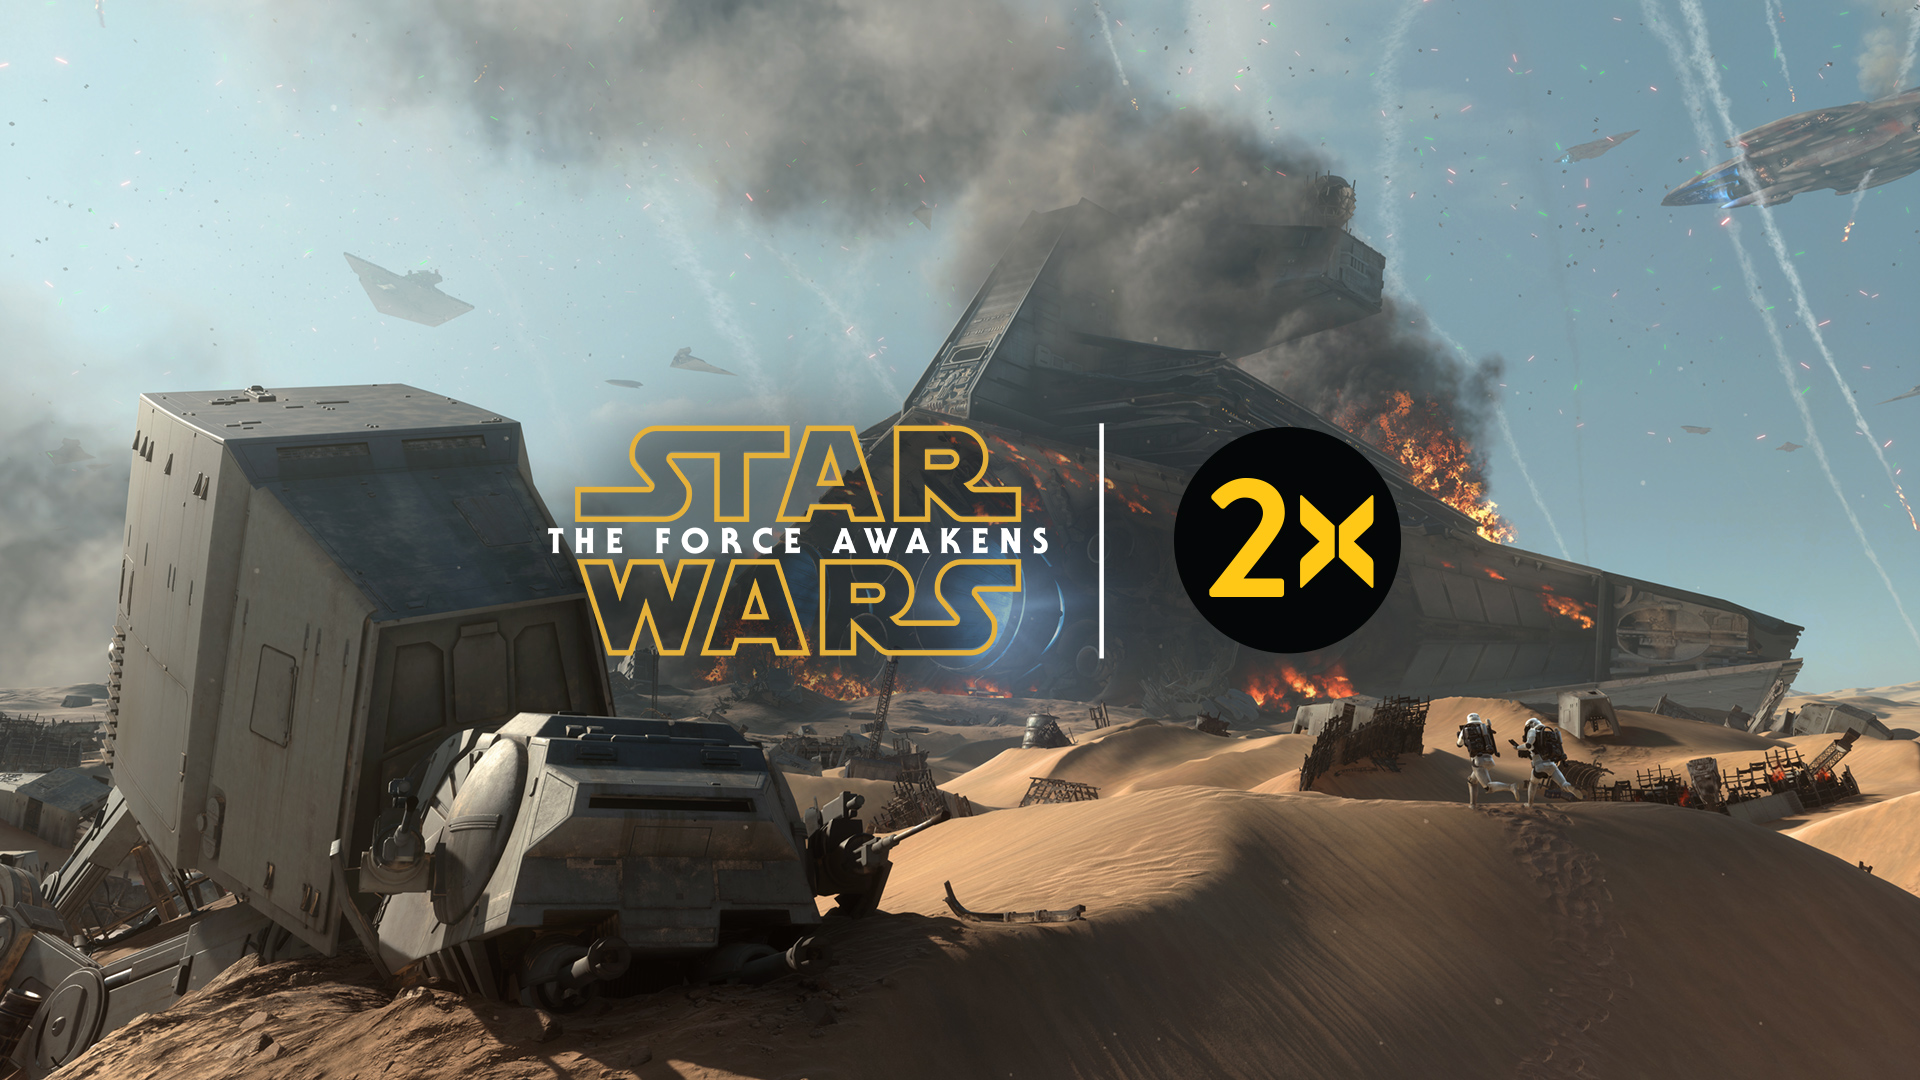 Bienvenue au Weekend Double Score dans Star Wars Battlefront